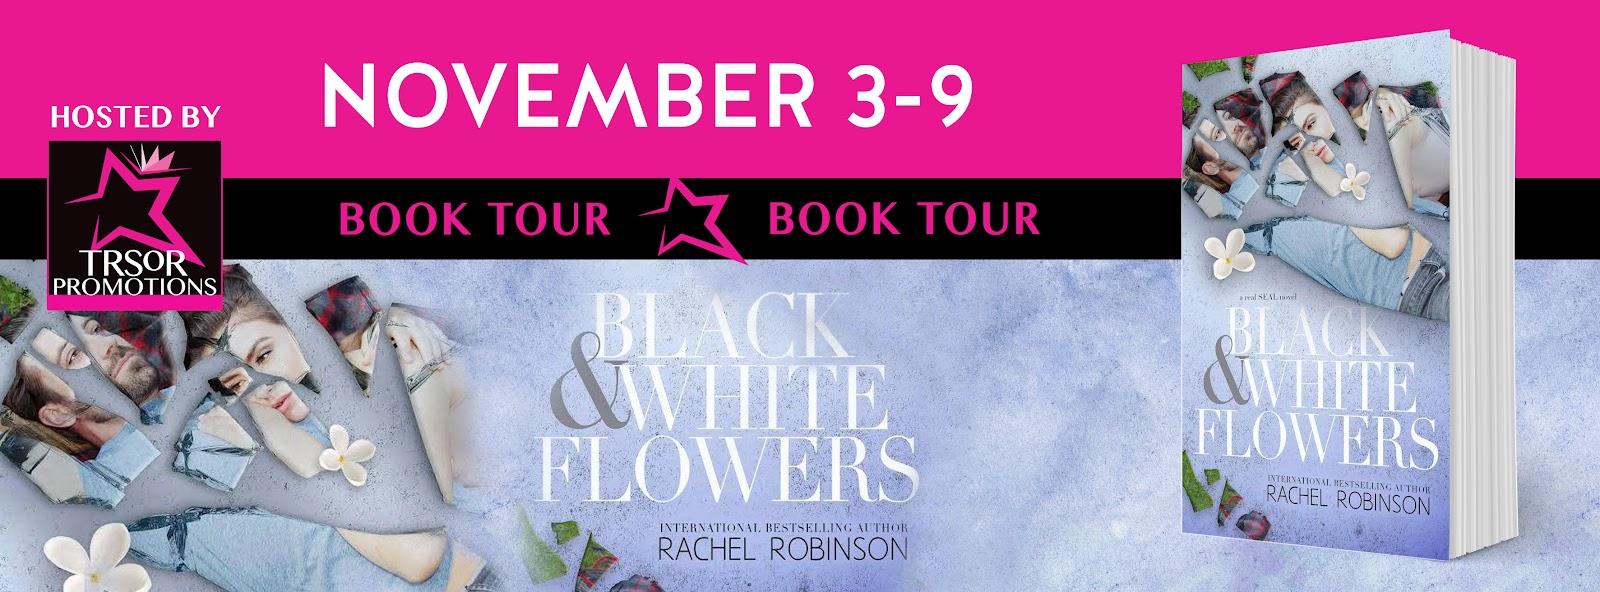 BW_FLOWERS_BOOK_TOUR.jpg